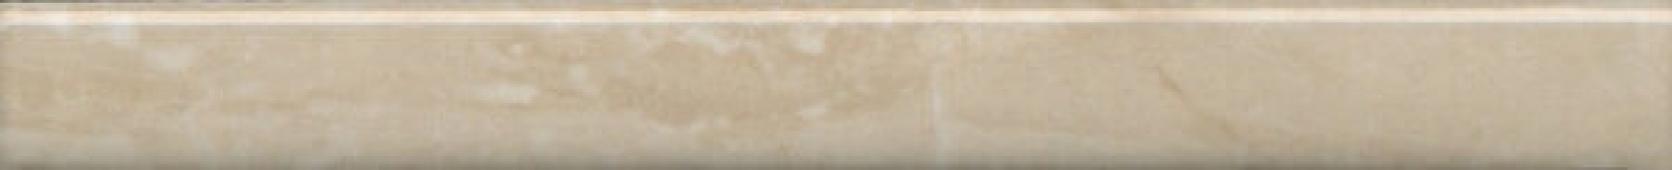 PFE024 Карандаш Стемма бежевый 20*2 бордюр